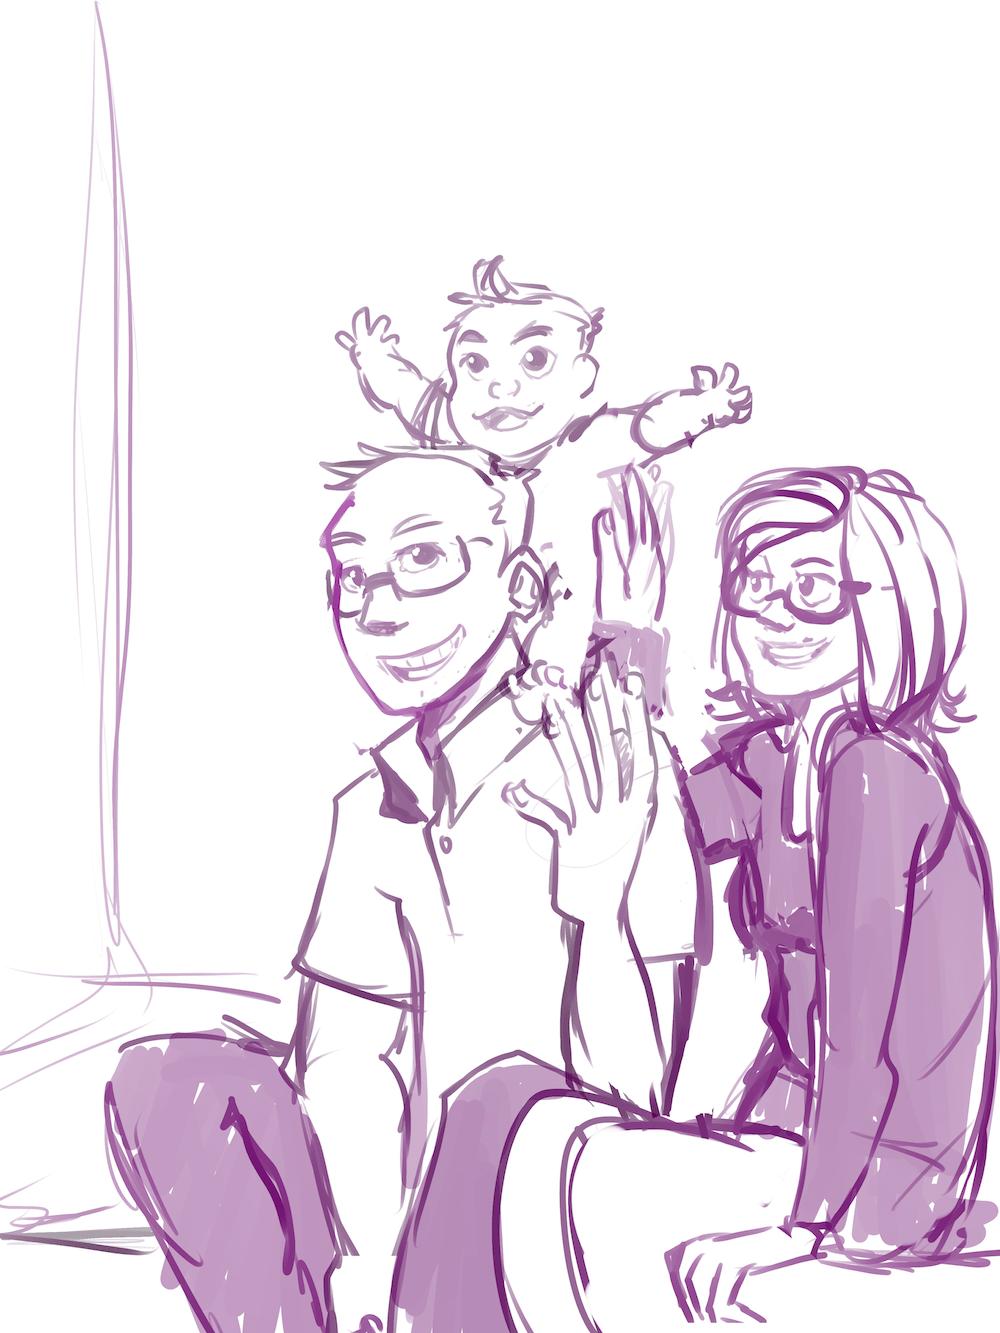 Draft Portrait of the Klawuhn Family by AruRmz